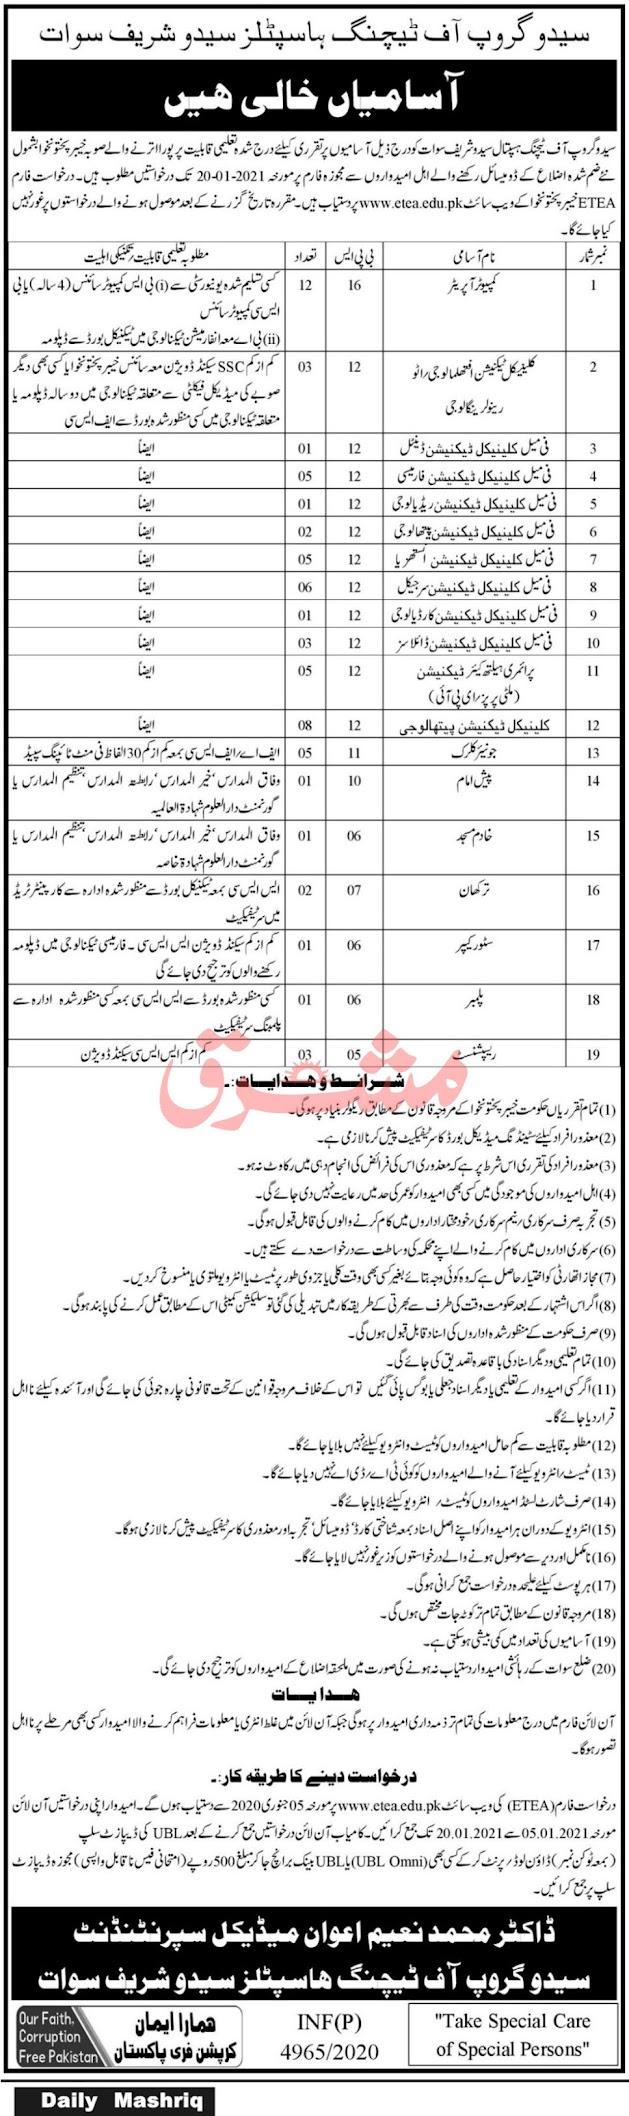 Saidu Group of Teaching Hospital Jobs 2021 - Swat Jobs 2021 - Government of KPK Jobs 2021